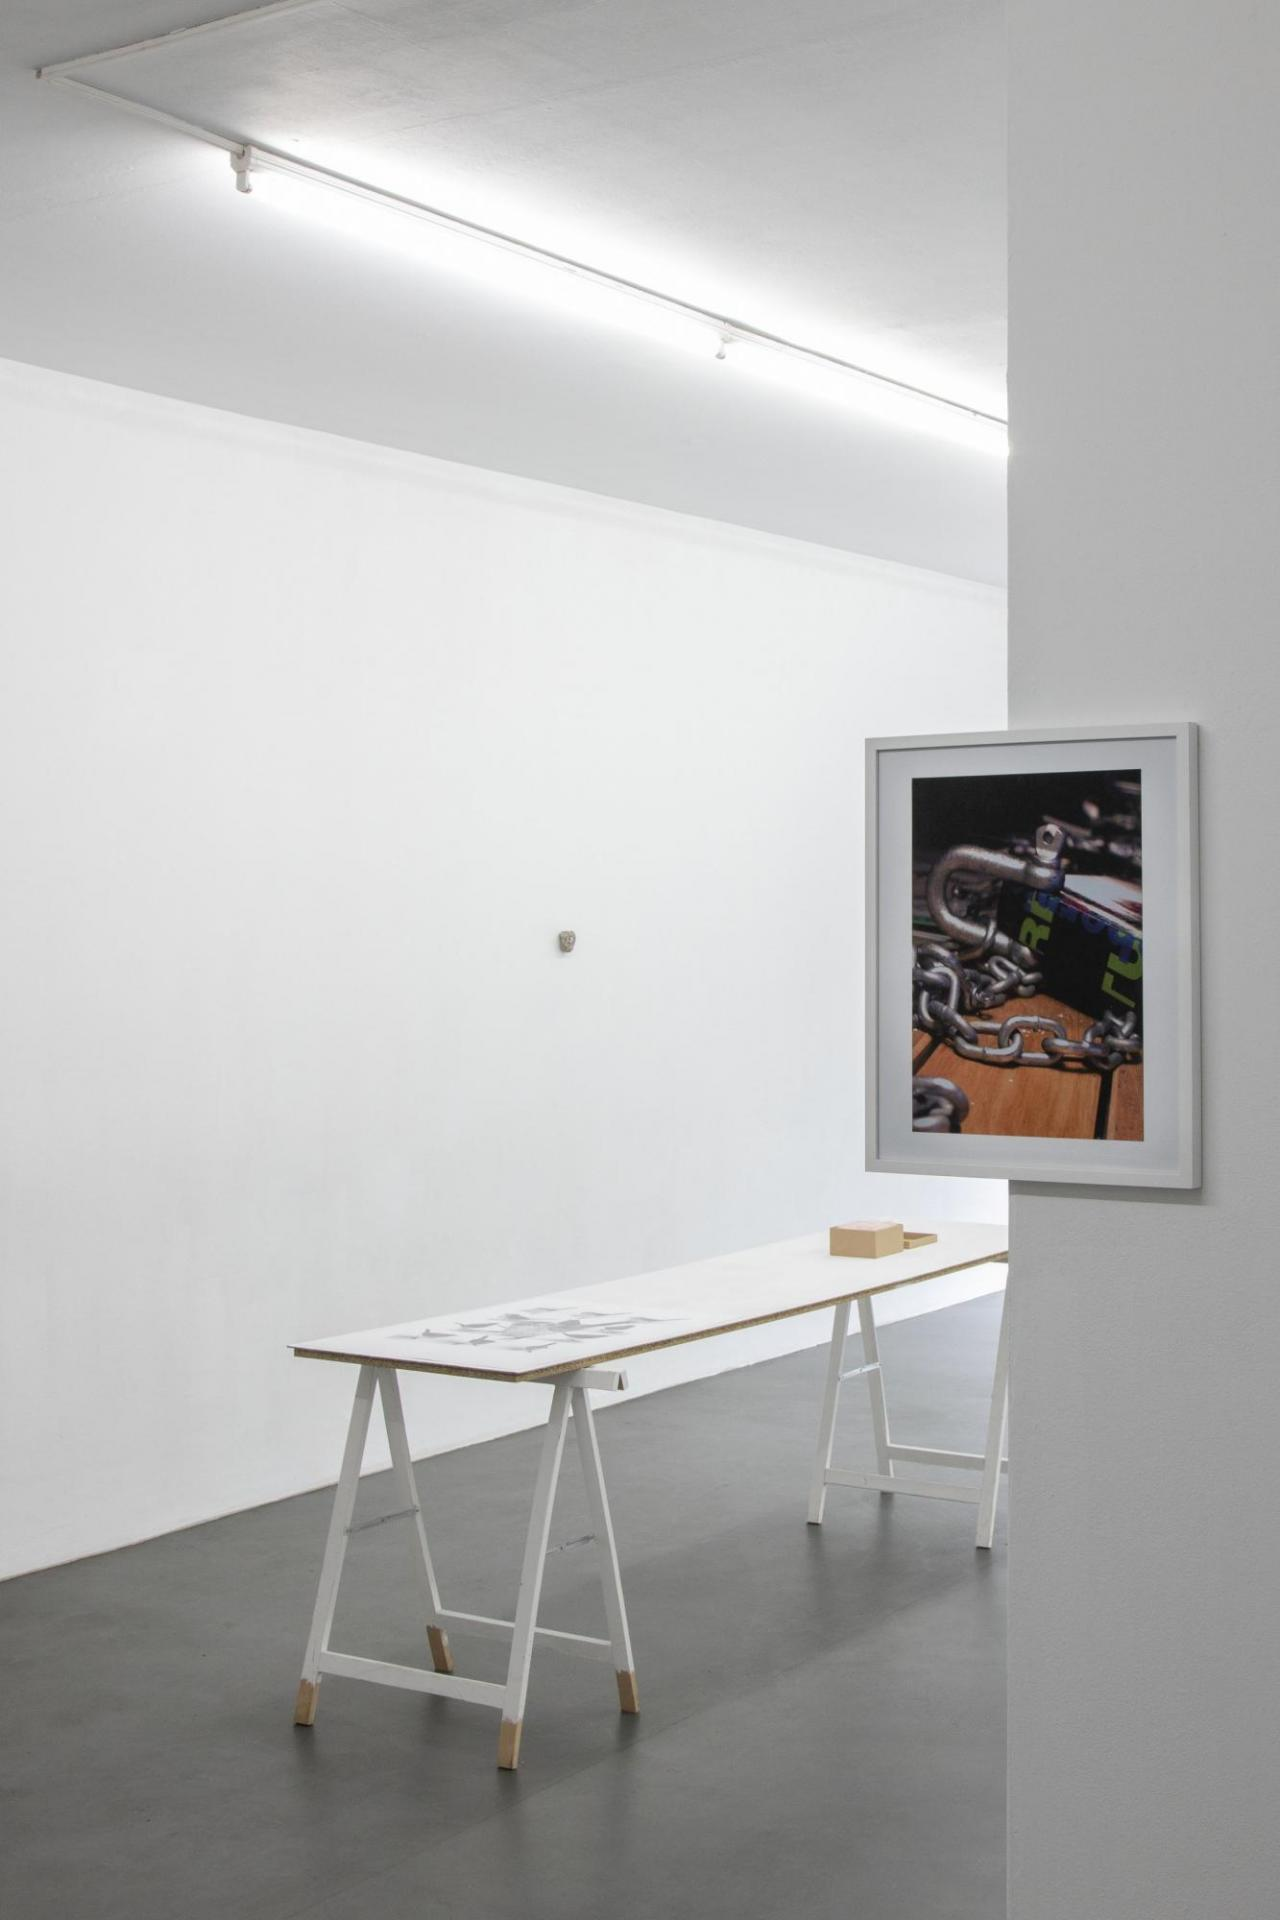 Heimo Zobernig Infolounge, Biennale of Sydney 2004 [detail] , 2018 C-print